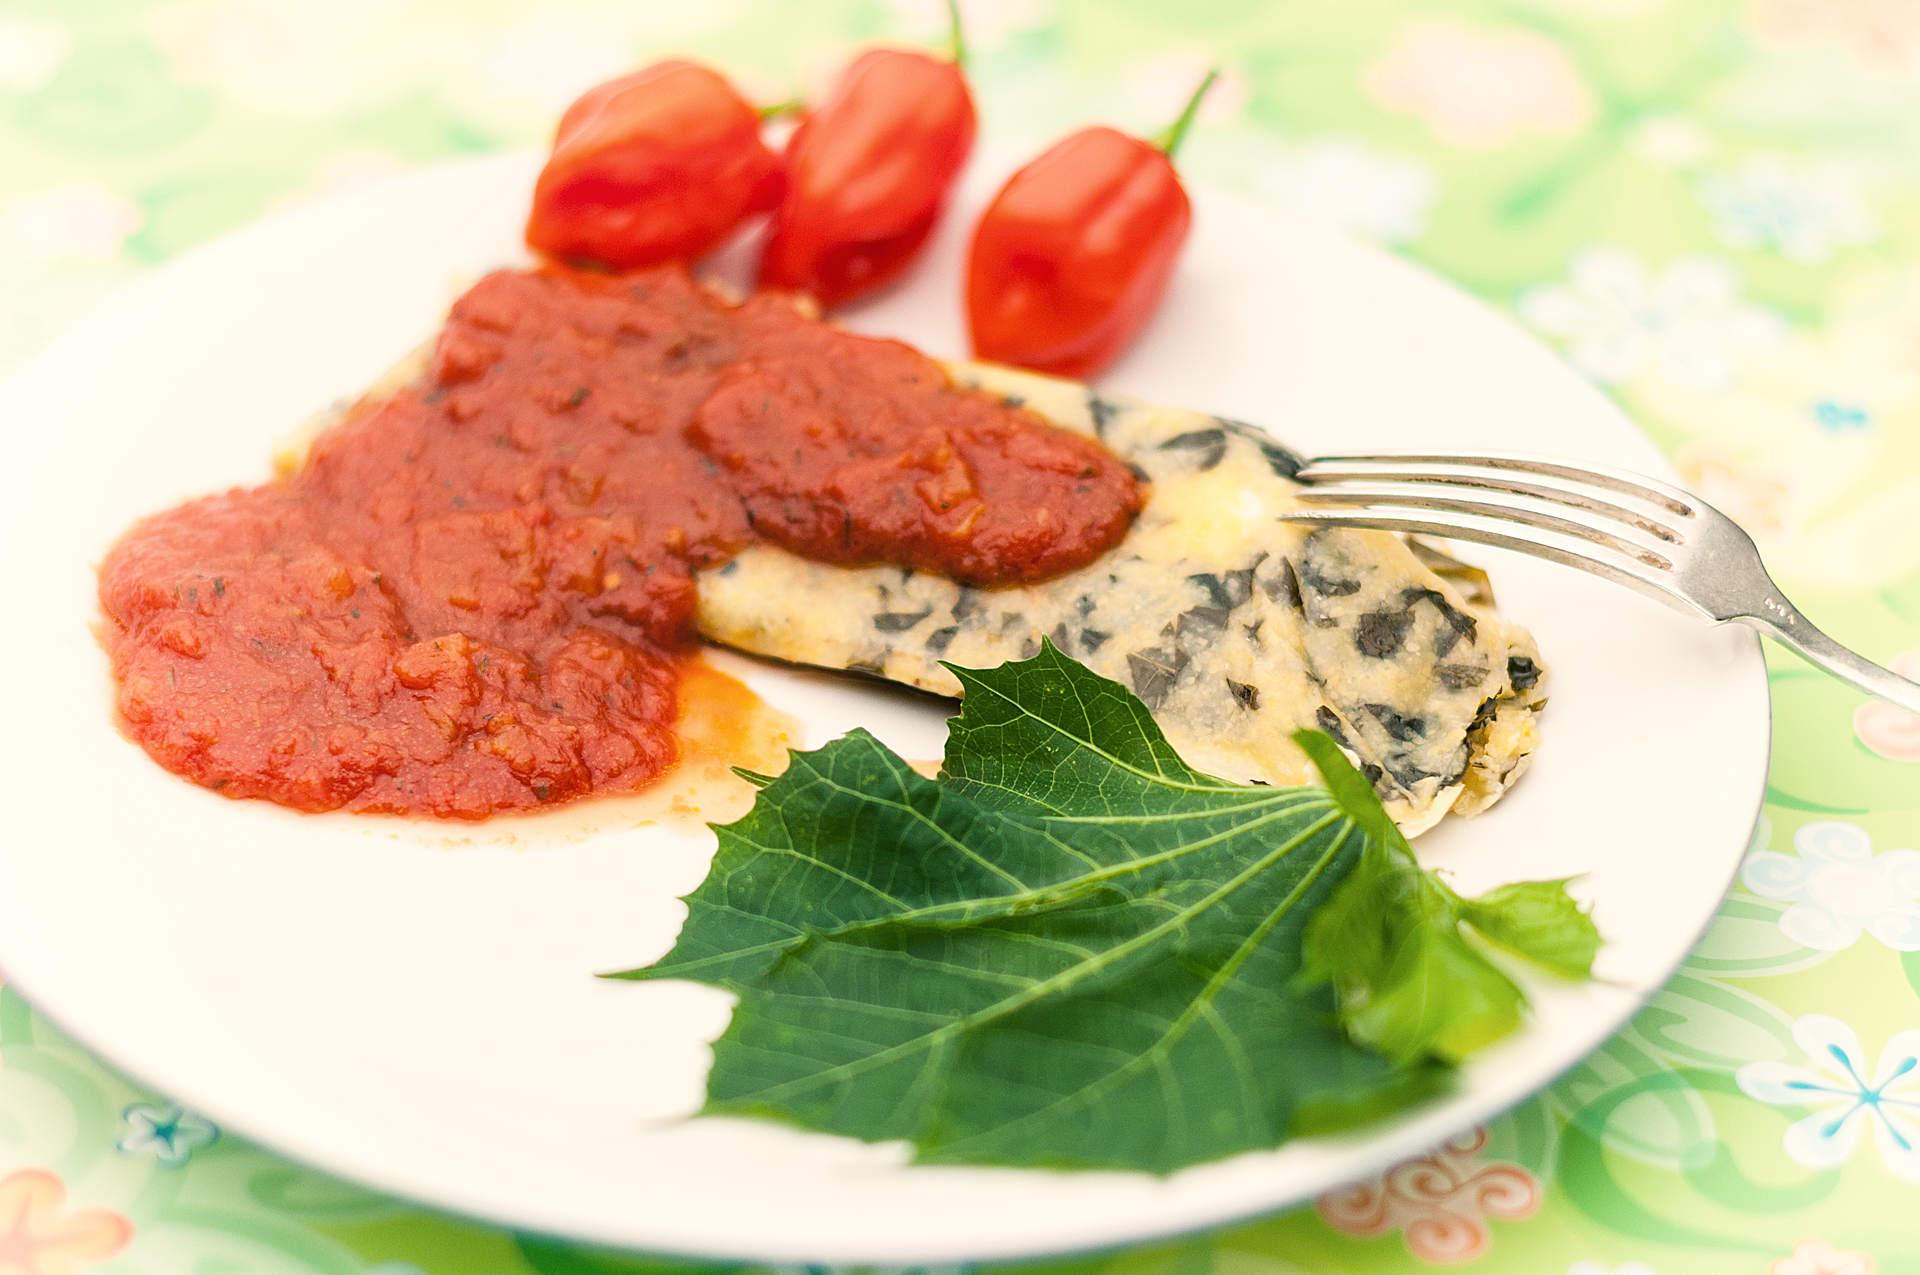 Entradas recetas mexicanas de entradas 1 - Platos gourmet economicos ...